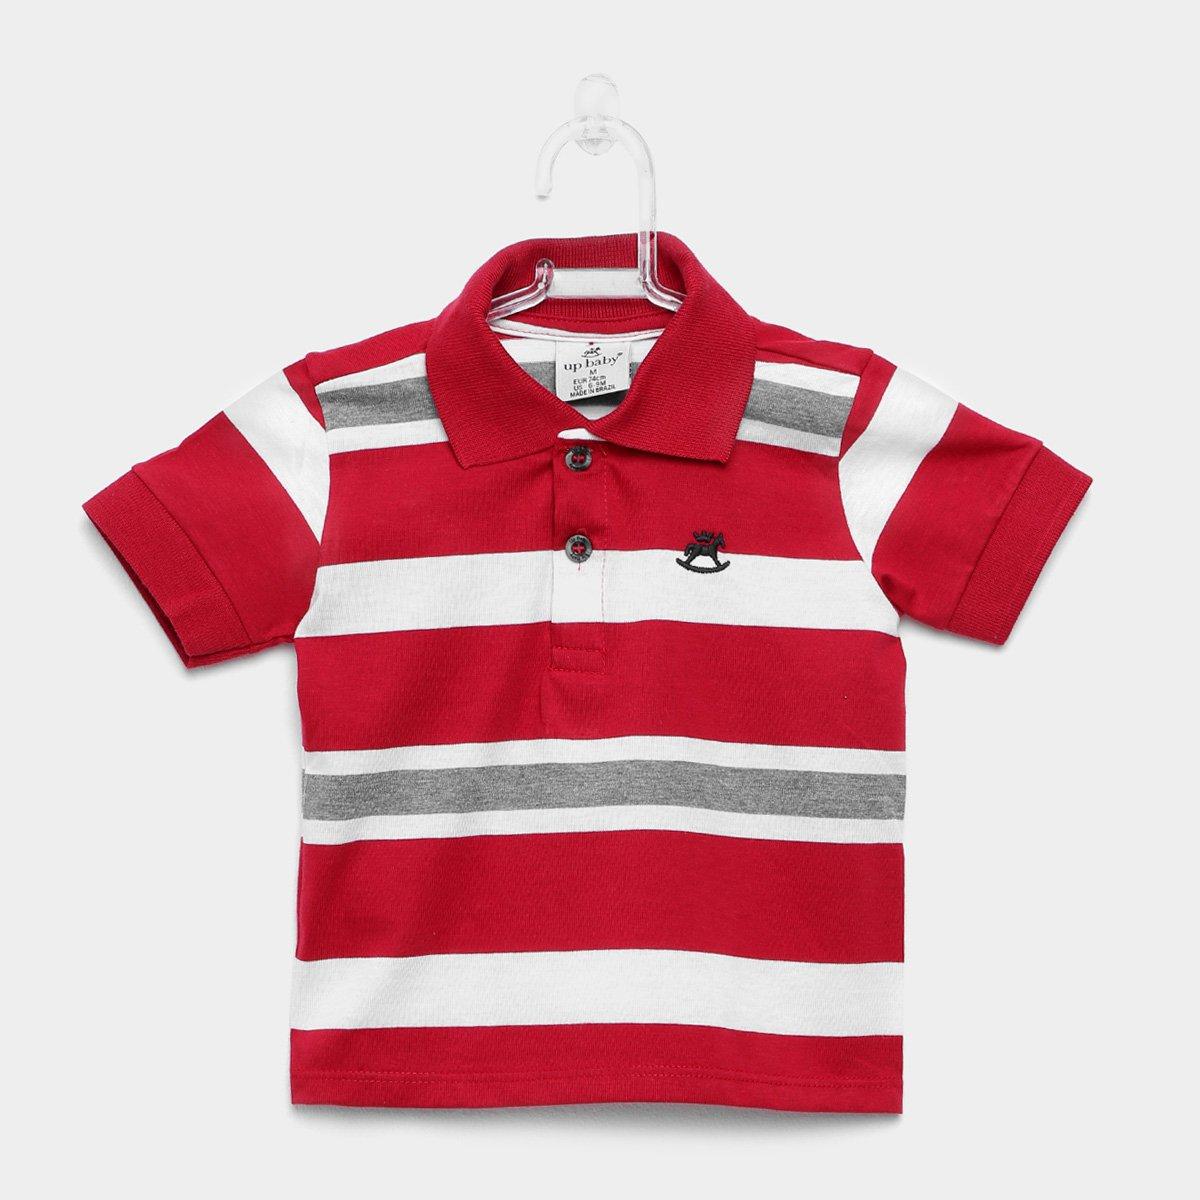 6d5a95c36 Camisa Polo Infantil Up Baby Malha Listrada Masculina